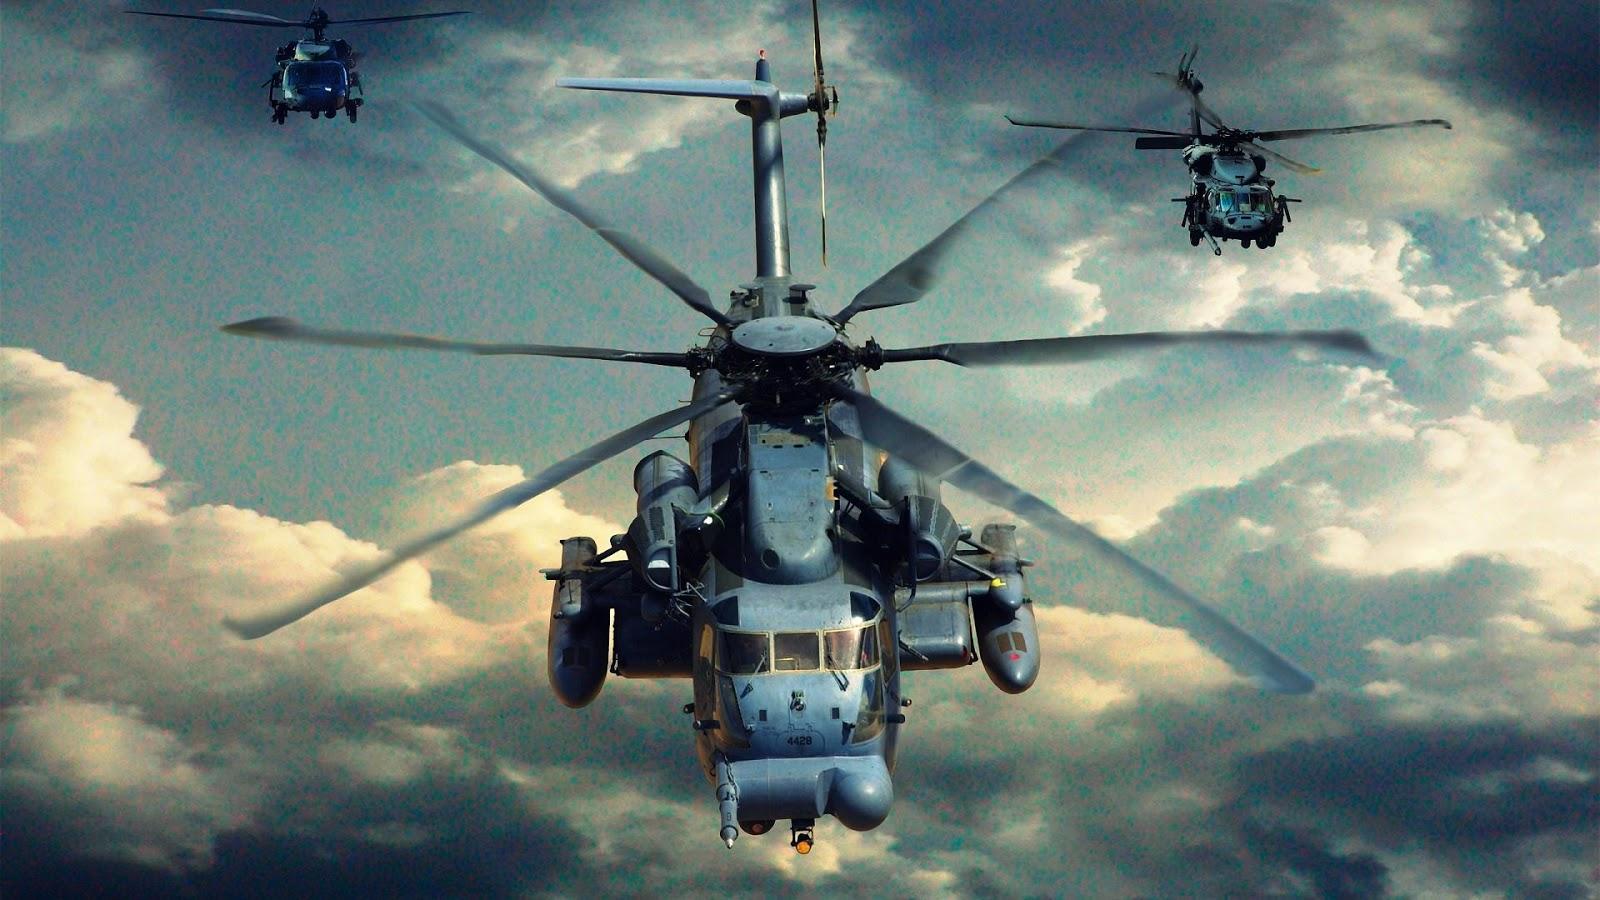 Un Elicottero : Elicottero d assalto theoverwatch